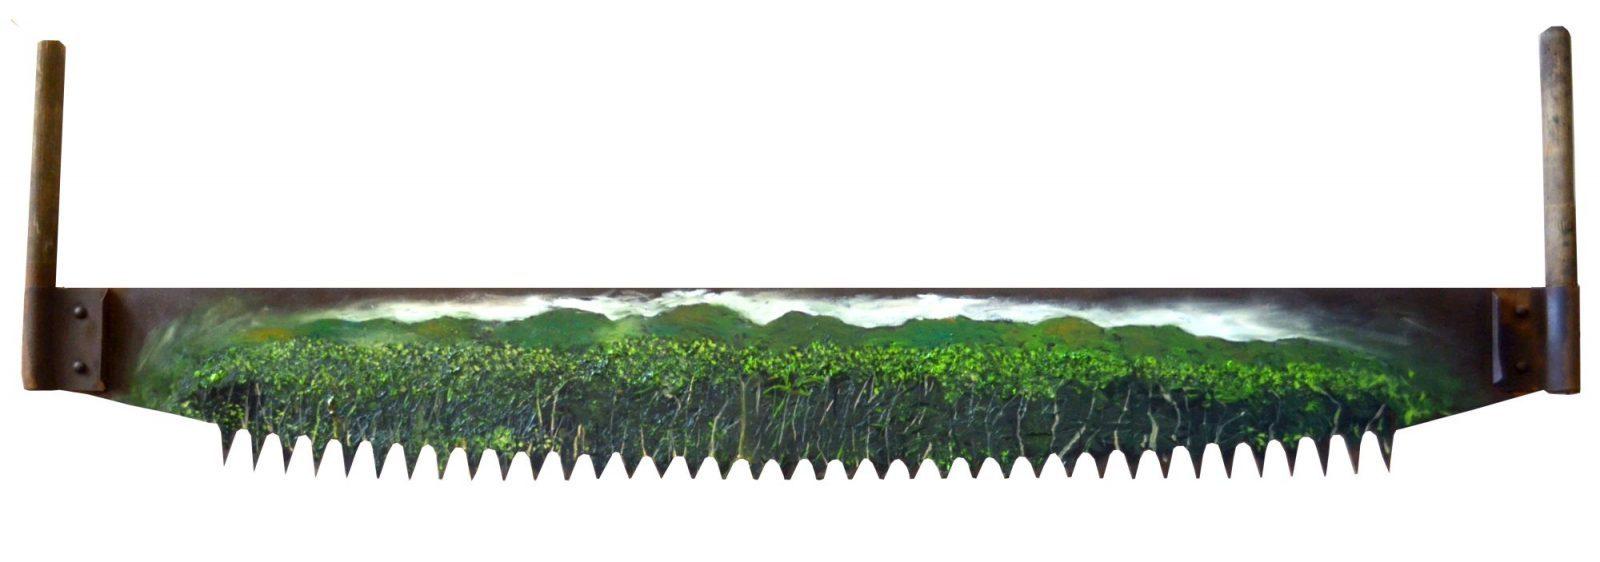 franyo aatoth: Landscape